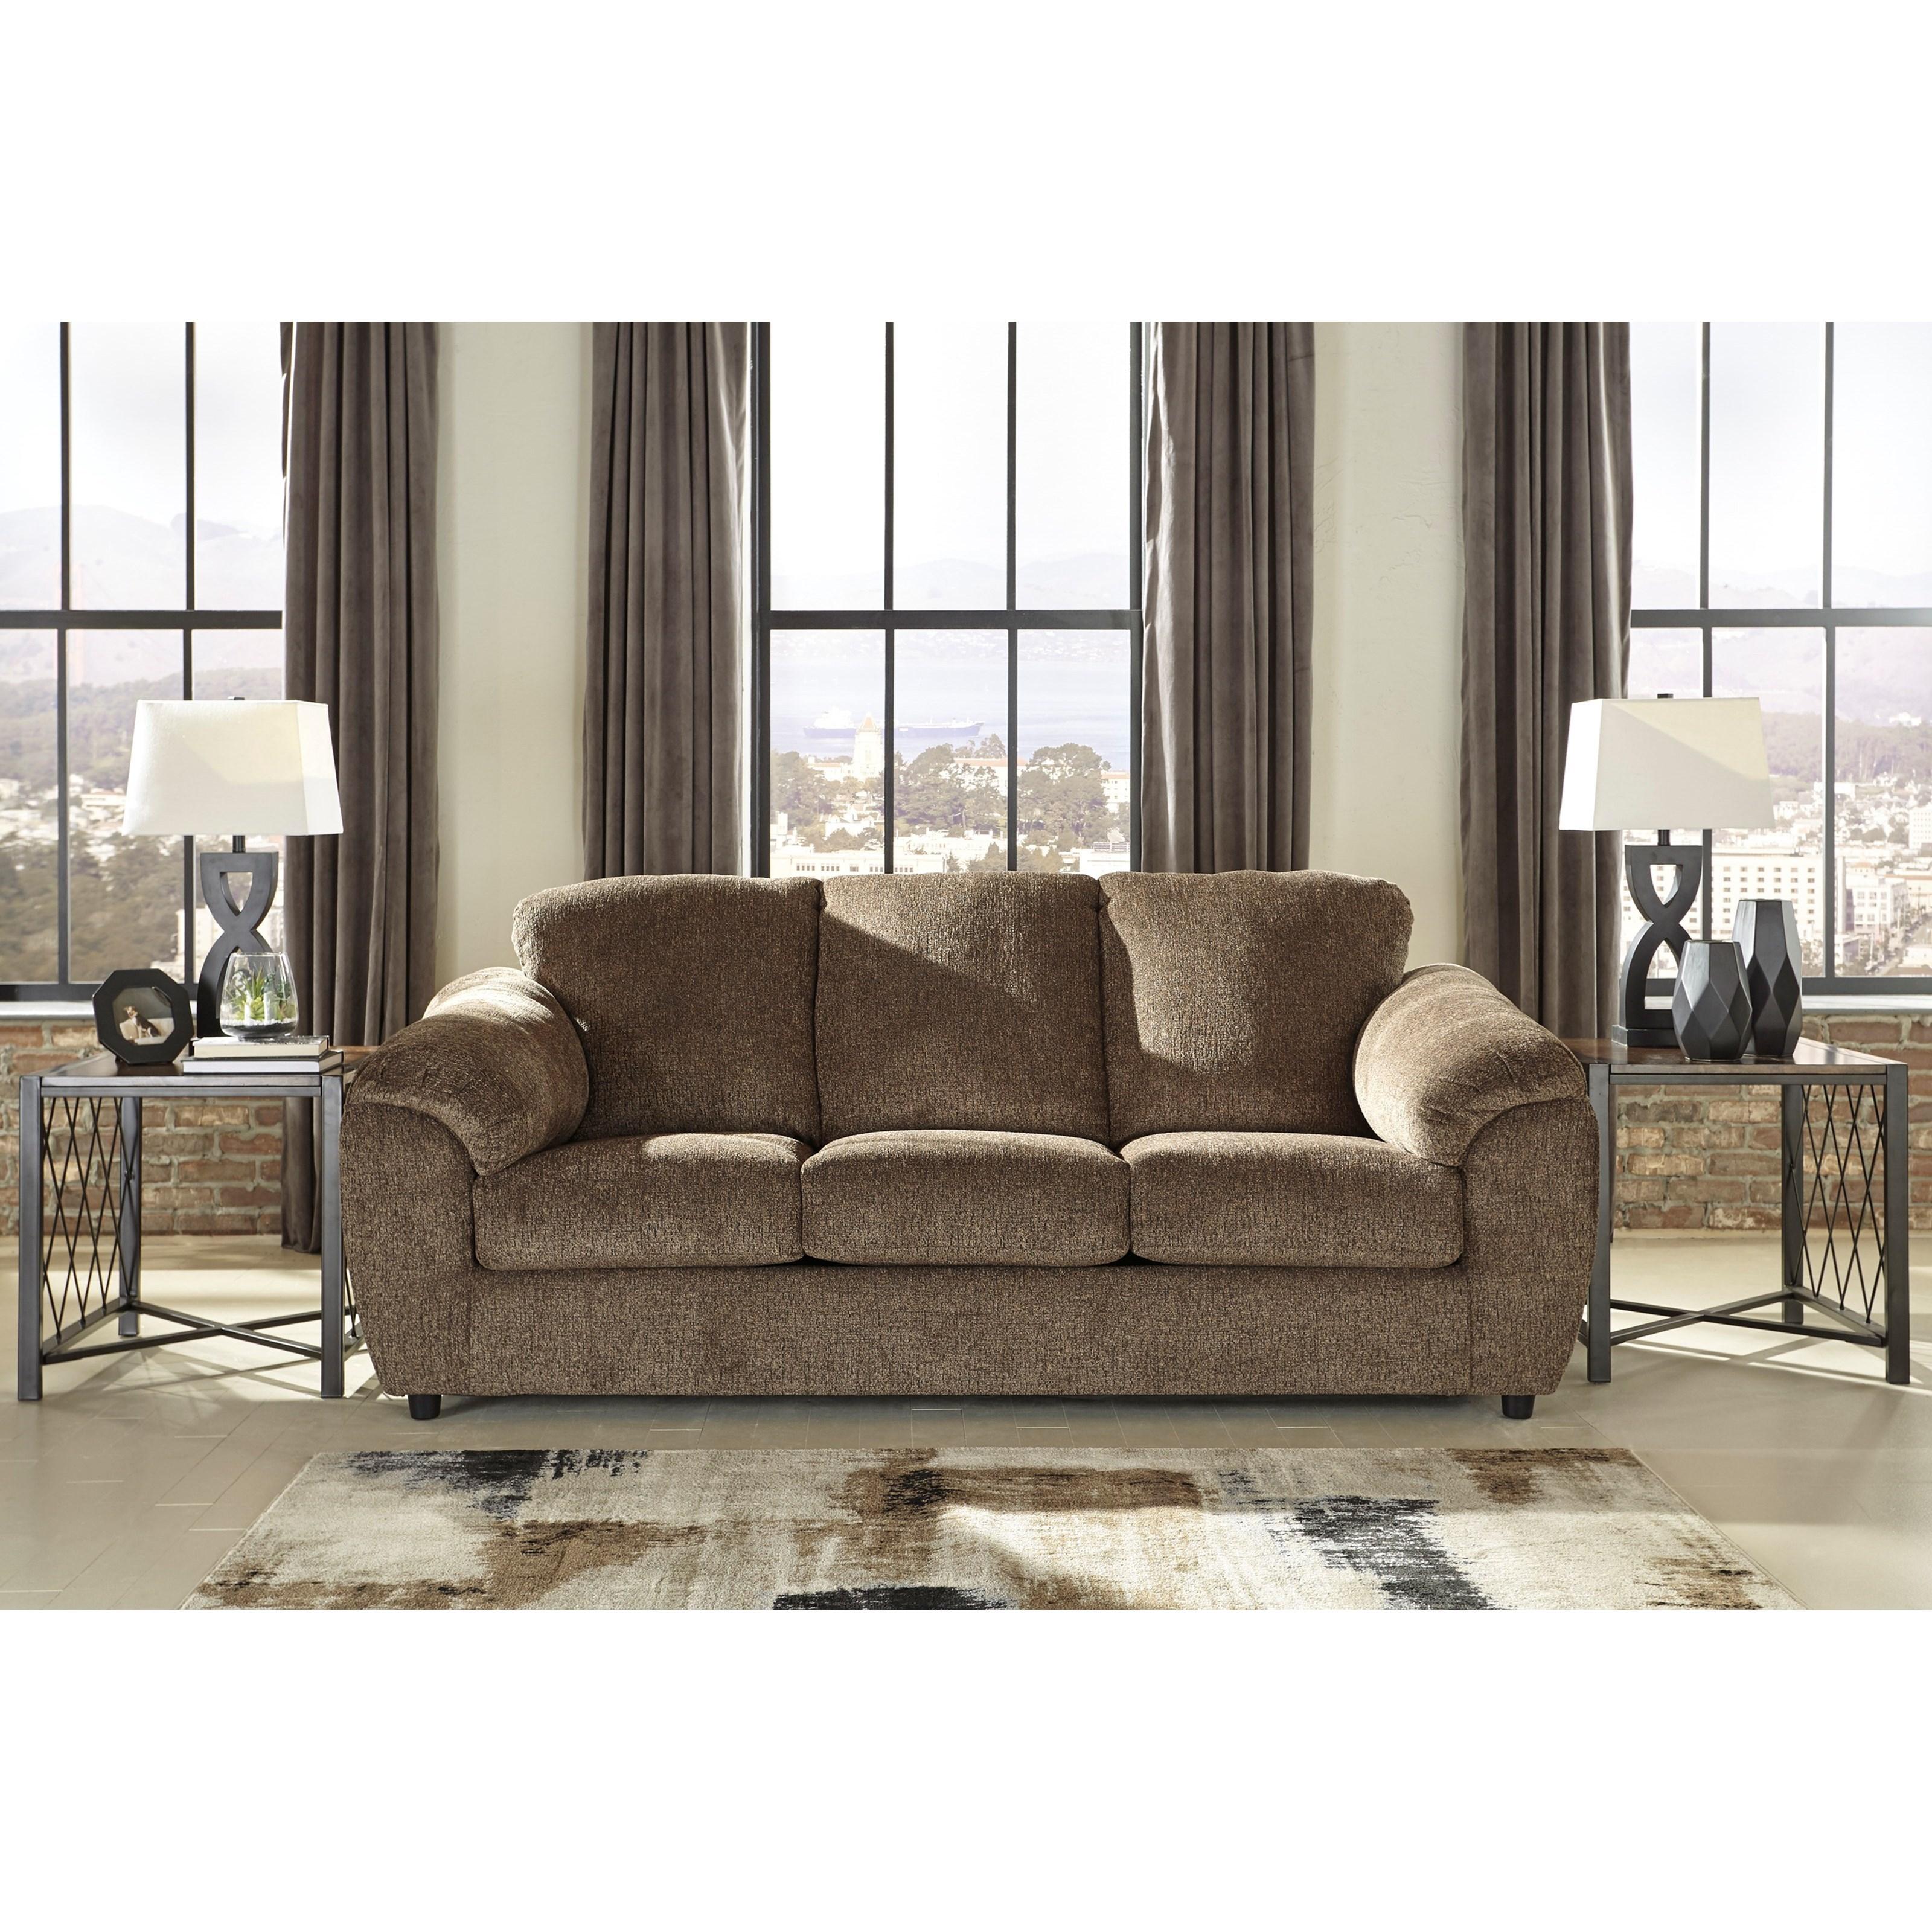 Signature design by ashley azaline 9320338 casual for Ashley furniture appleton